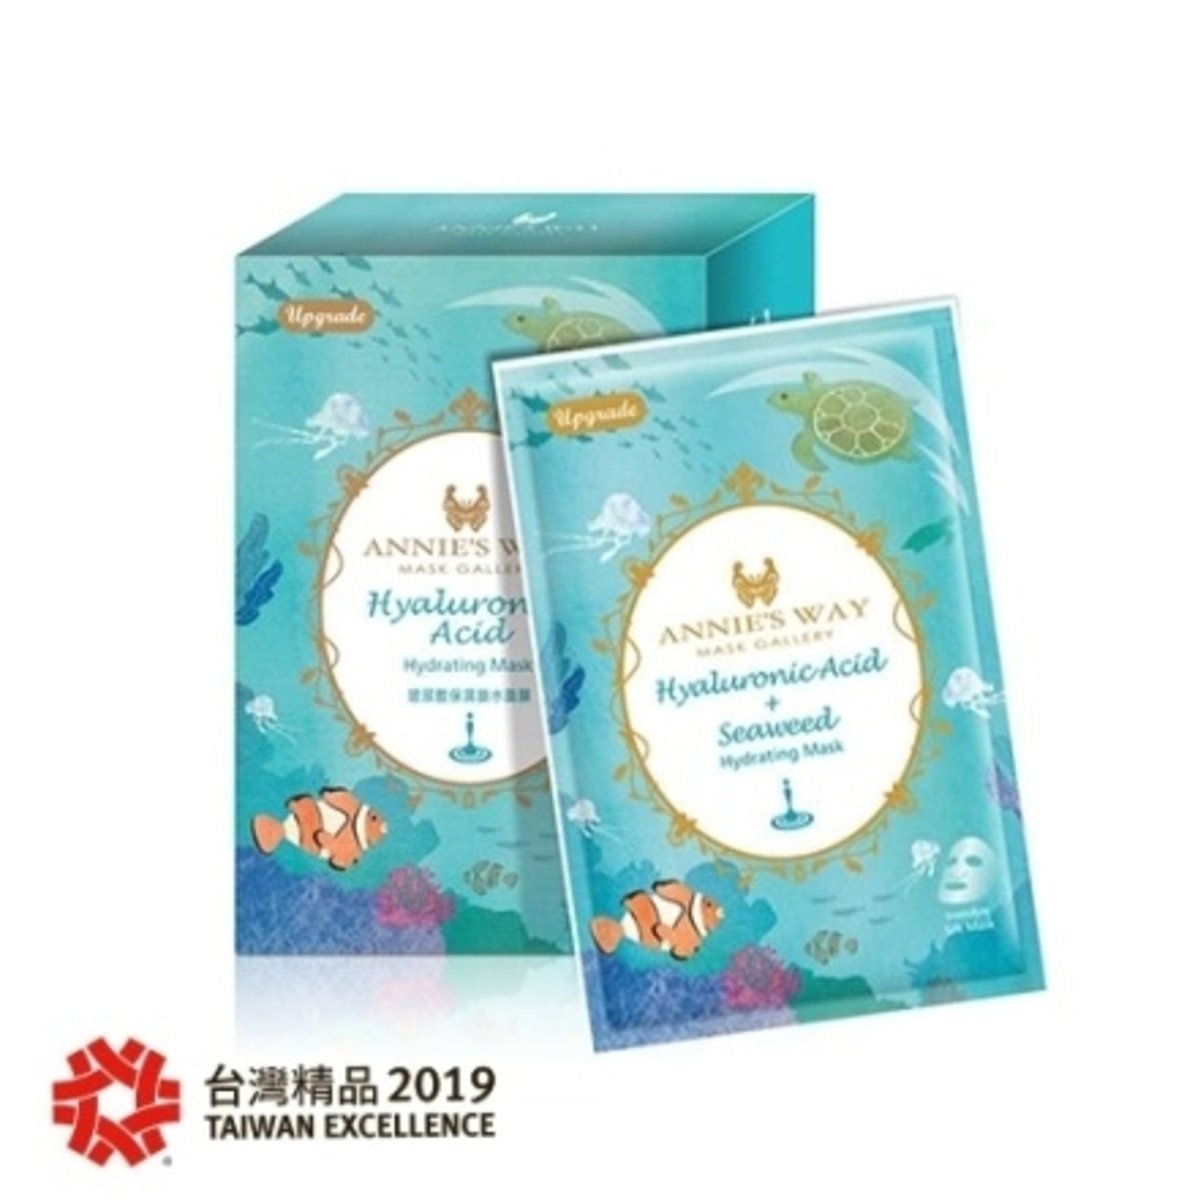 Hyaluronic Acid + Seaweed Hydrating Mask